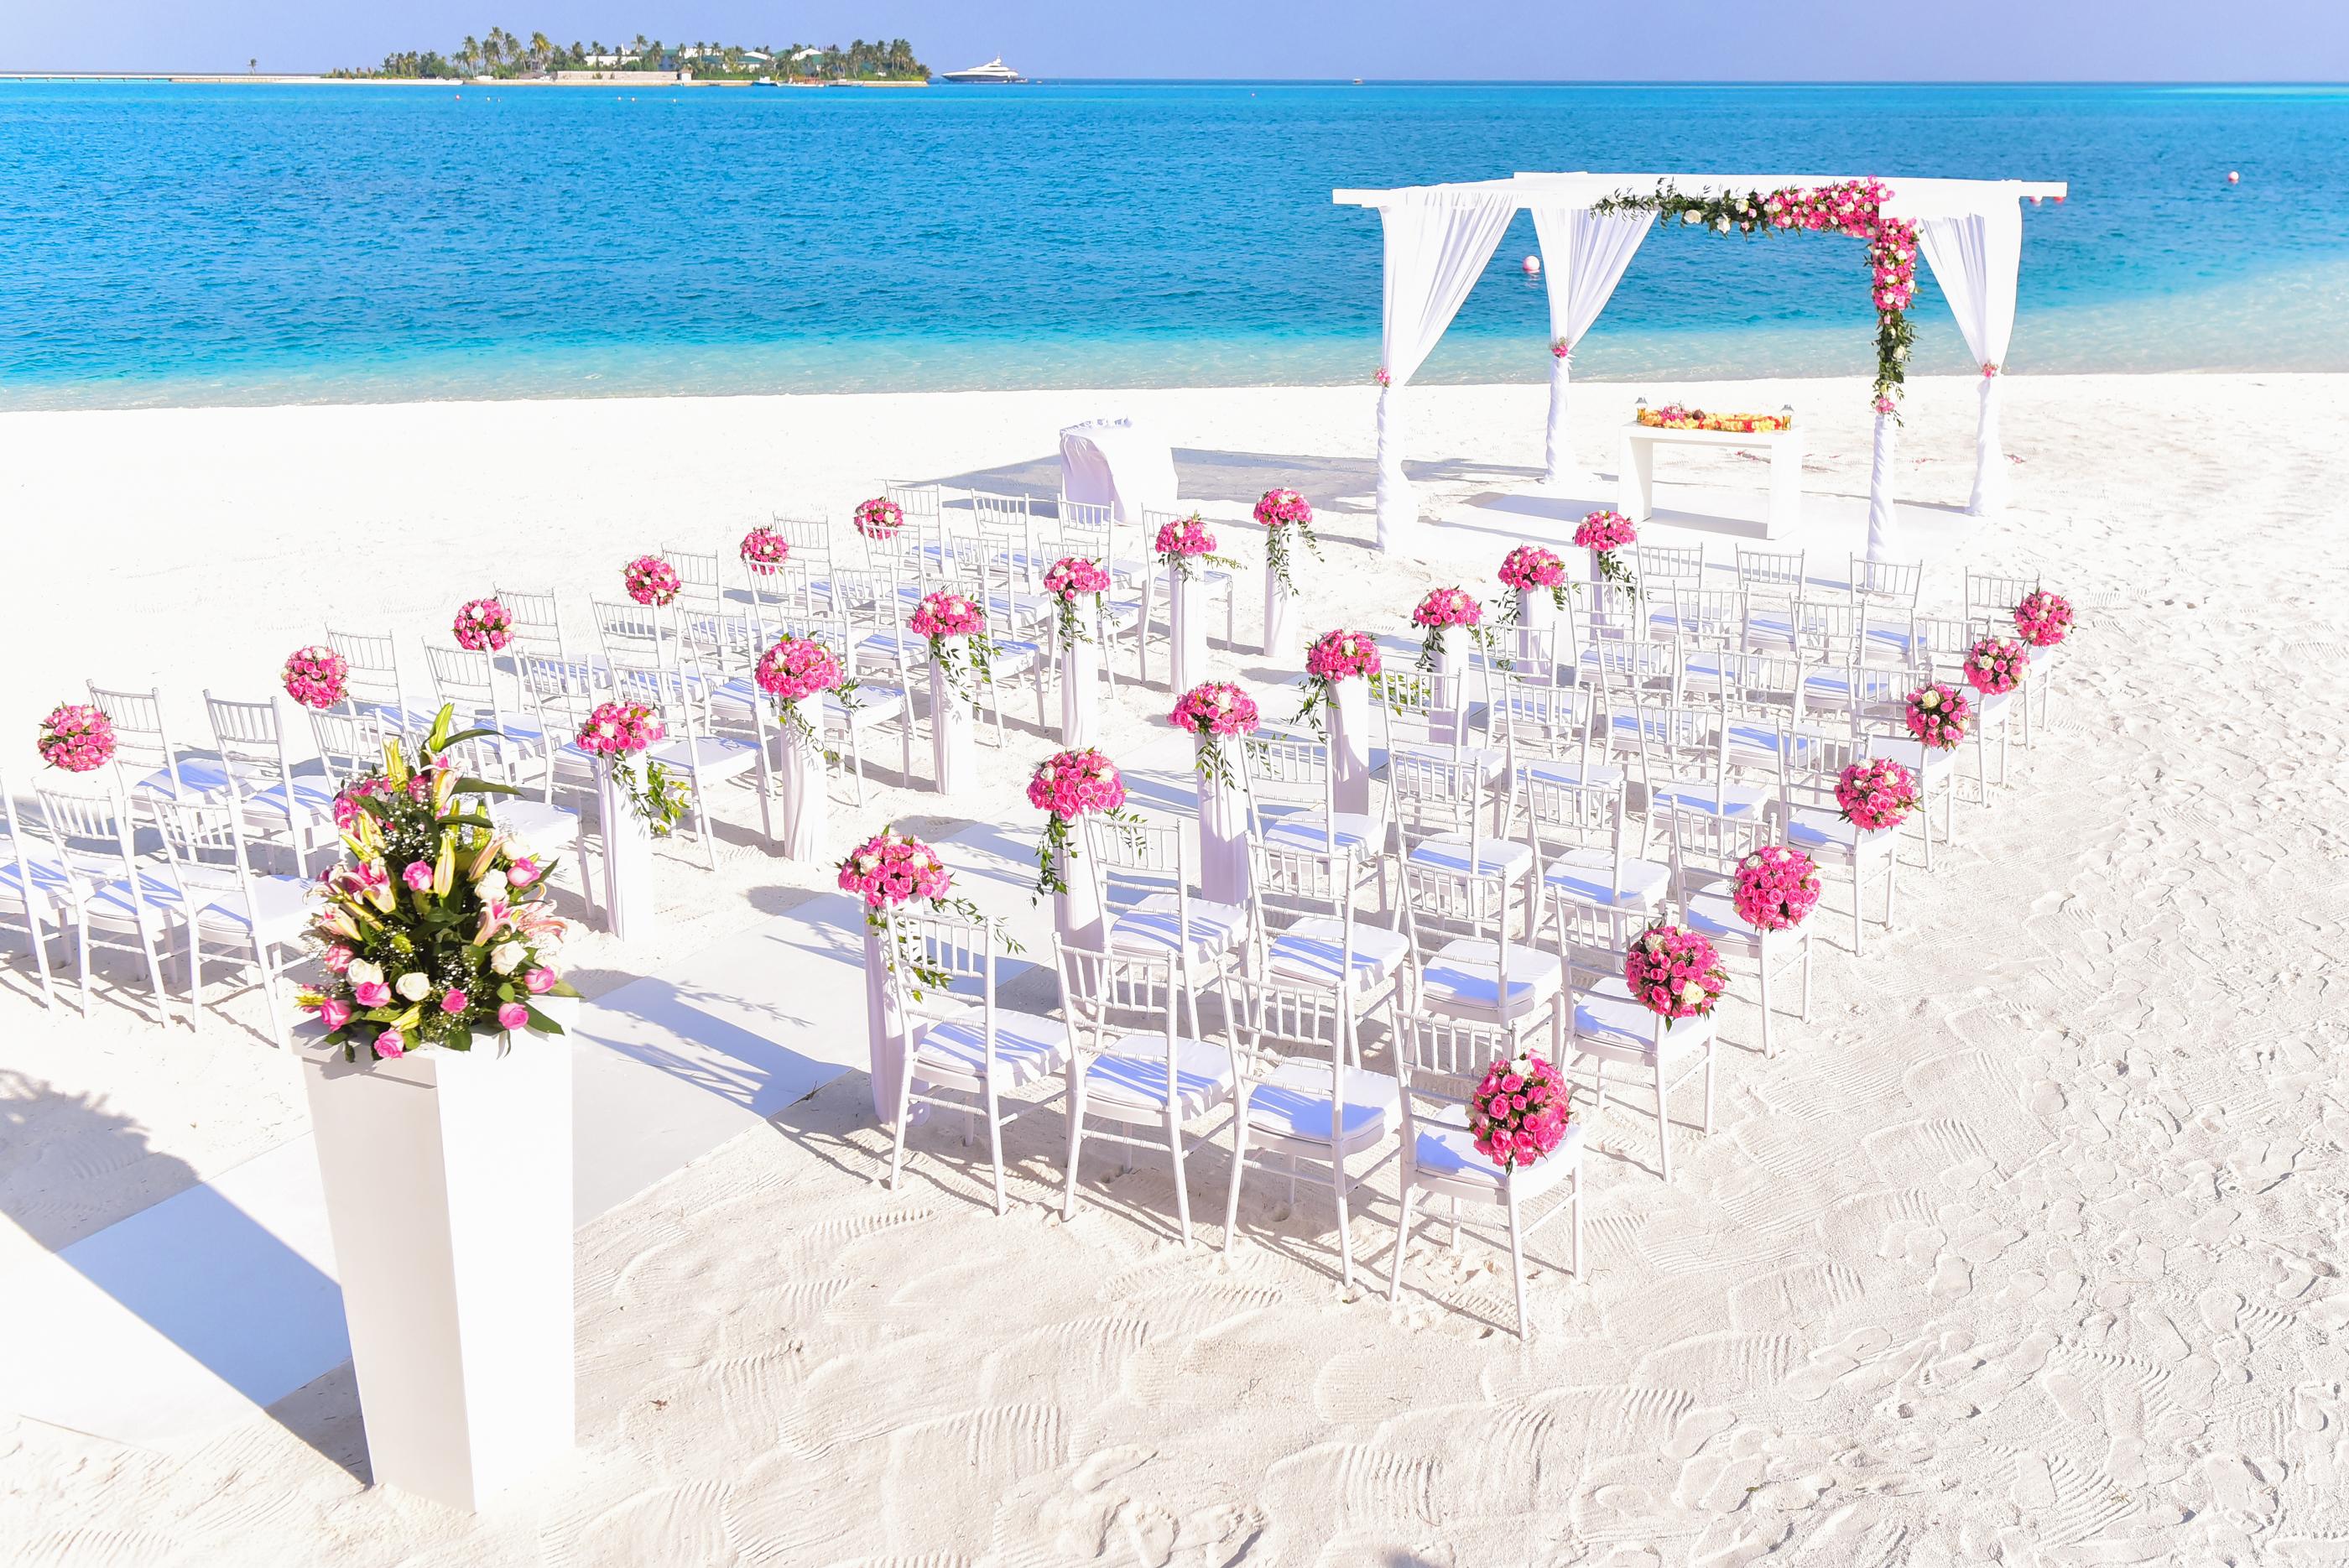 Free stock photos of beach wedding pexels free stock photo of sea sky sunny beach junglespirit Images